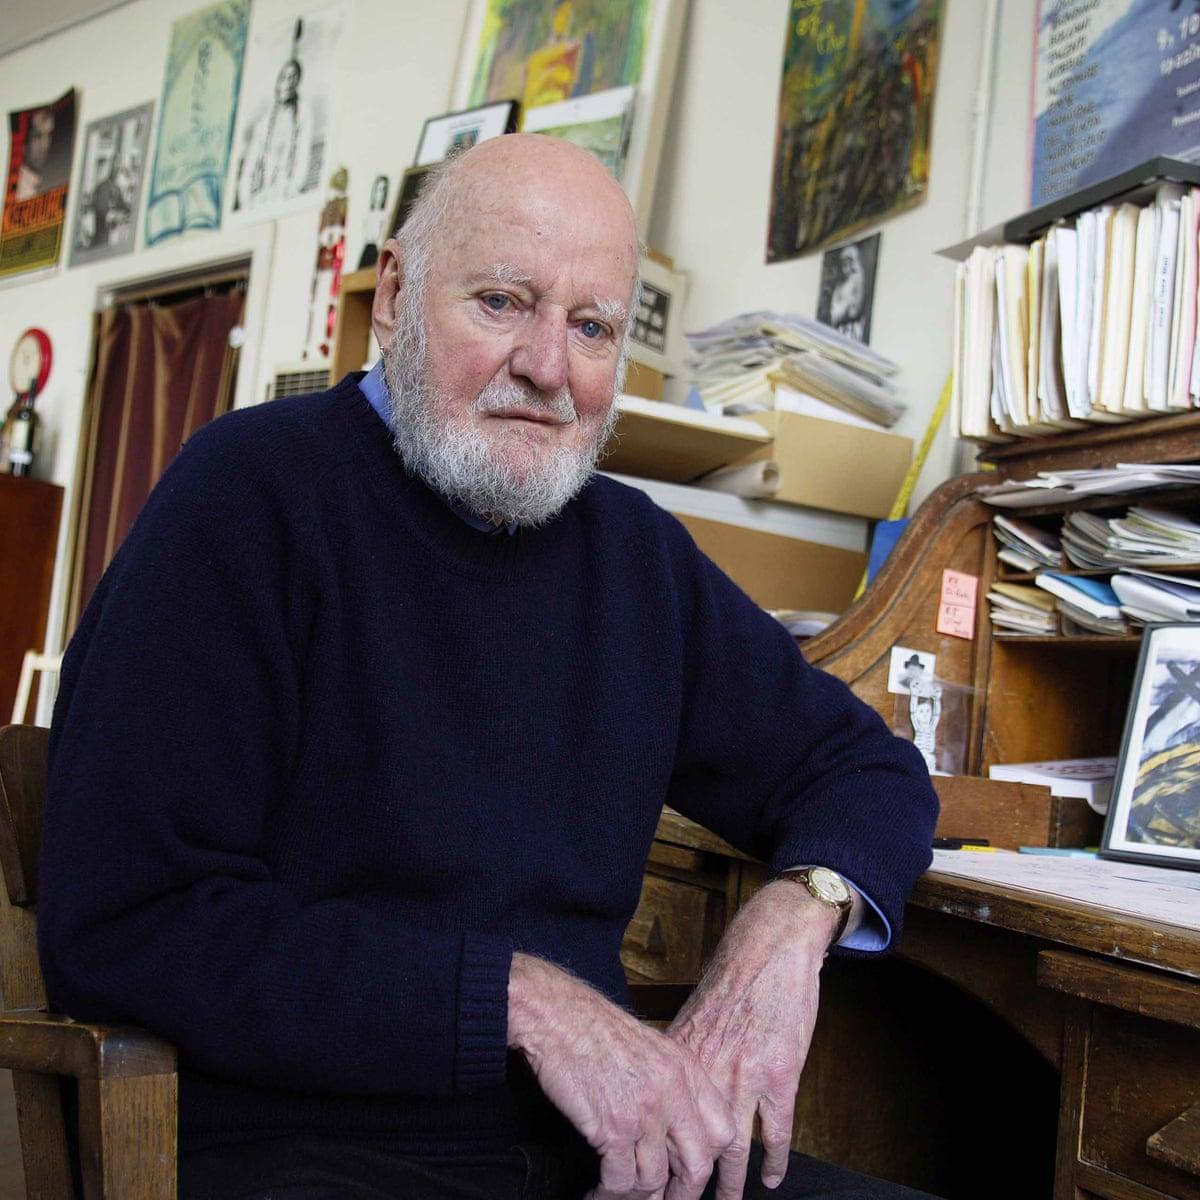 The soul of the city: San Francisco honors literary hero Lawrence  Ferlinghetti | San Francisco